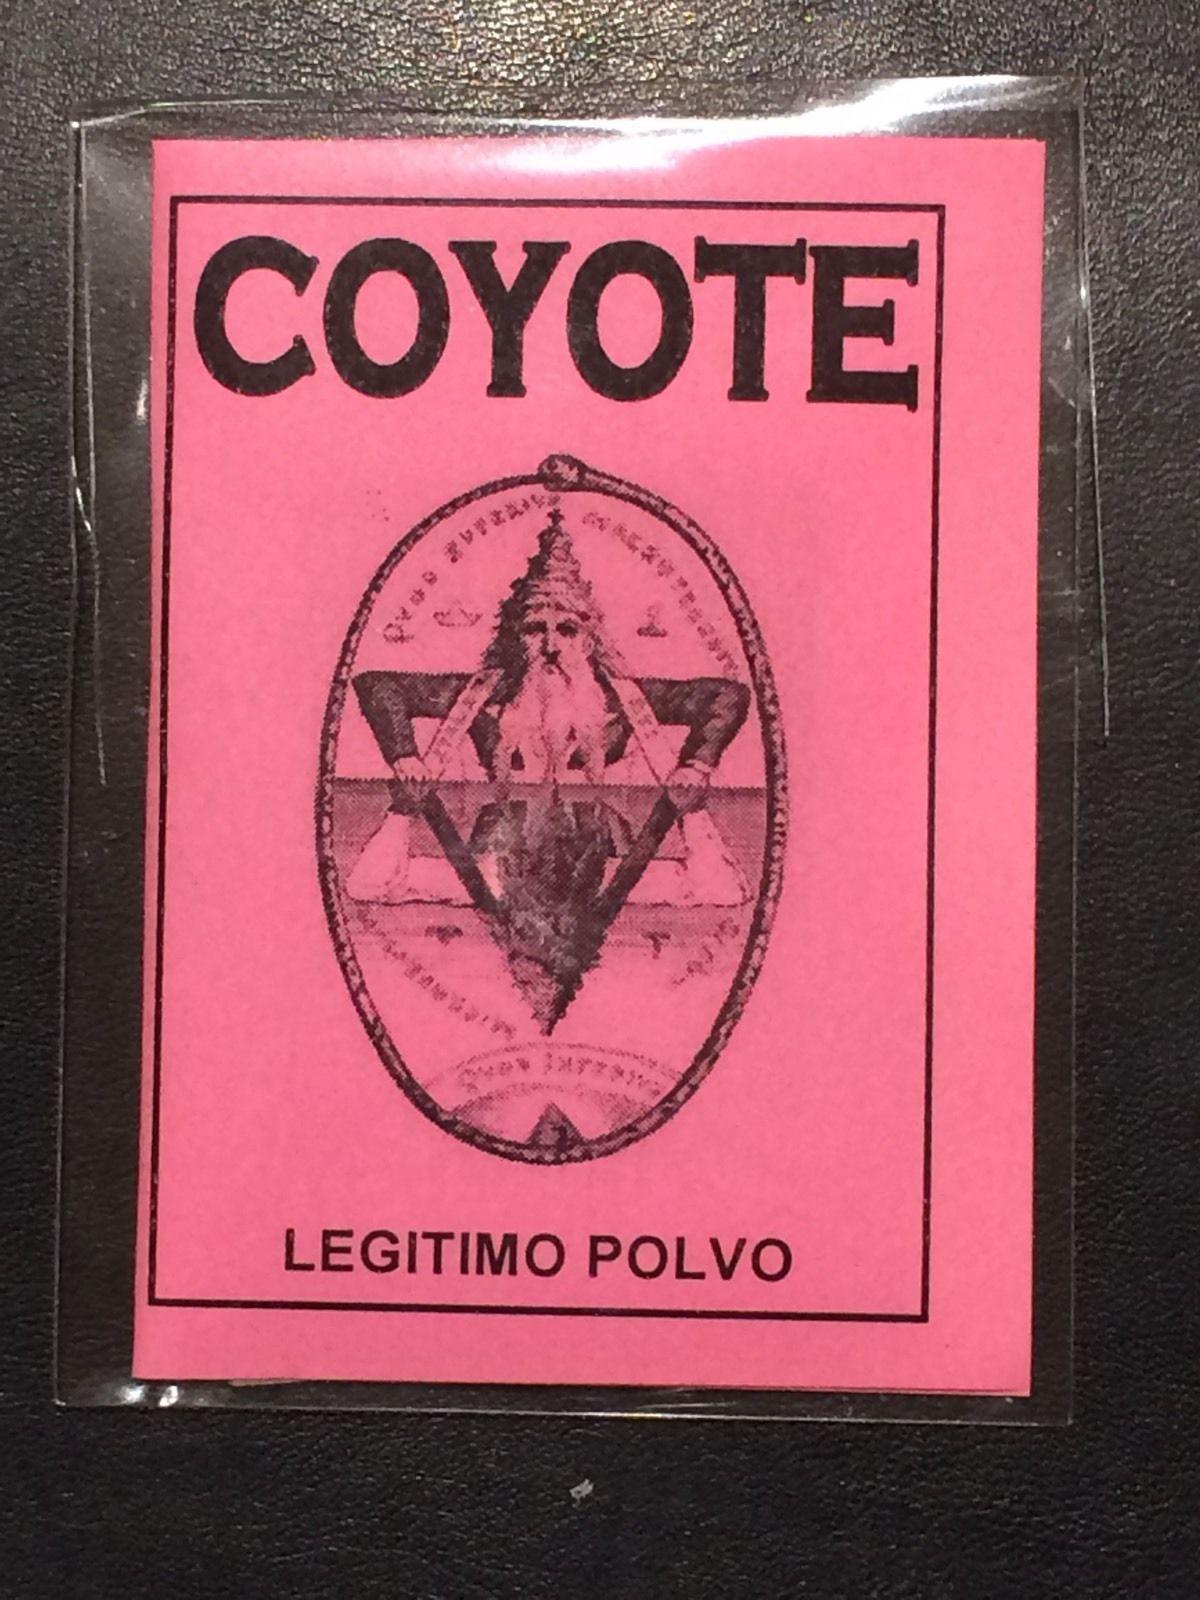 LEGITIMO POLVO ESOTERICO COYOTE